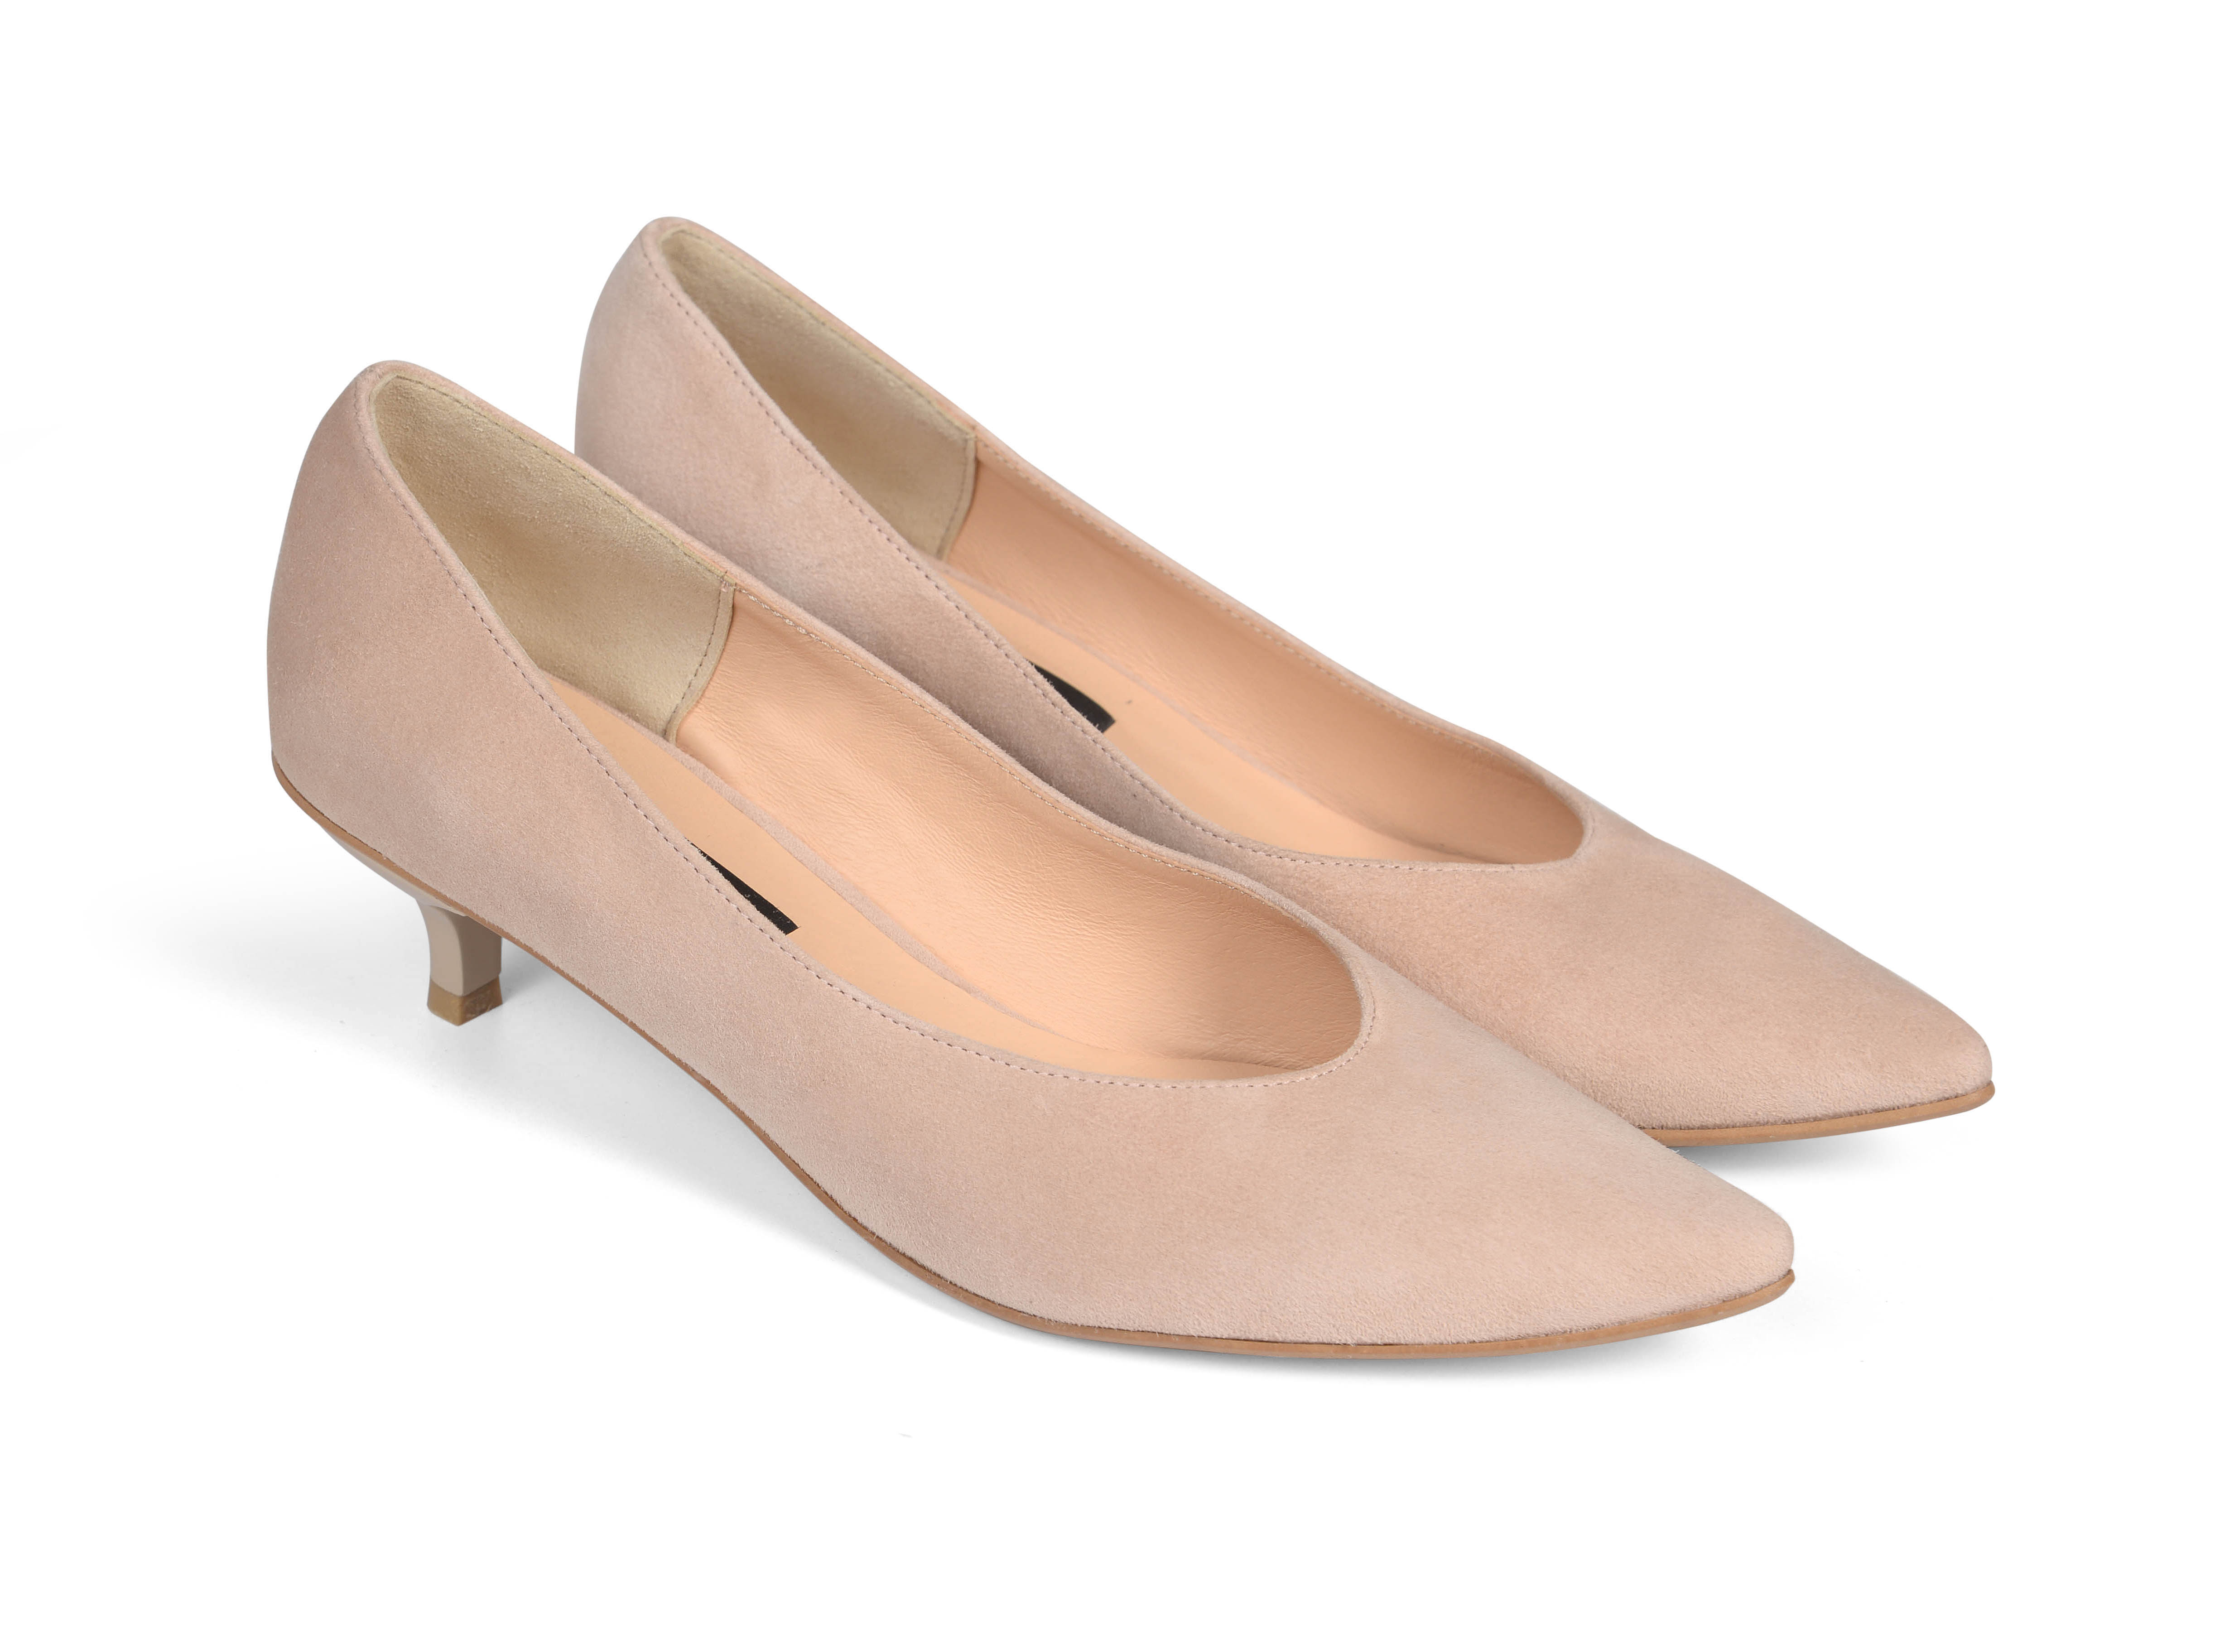 Kiki S pointed toe kitten heels - nude suede